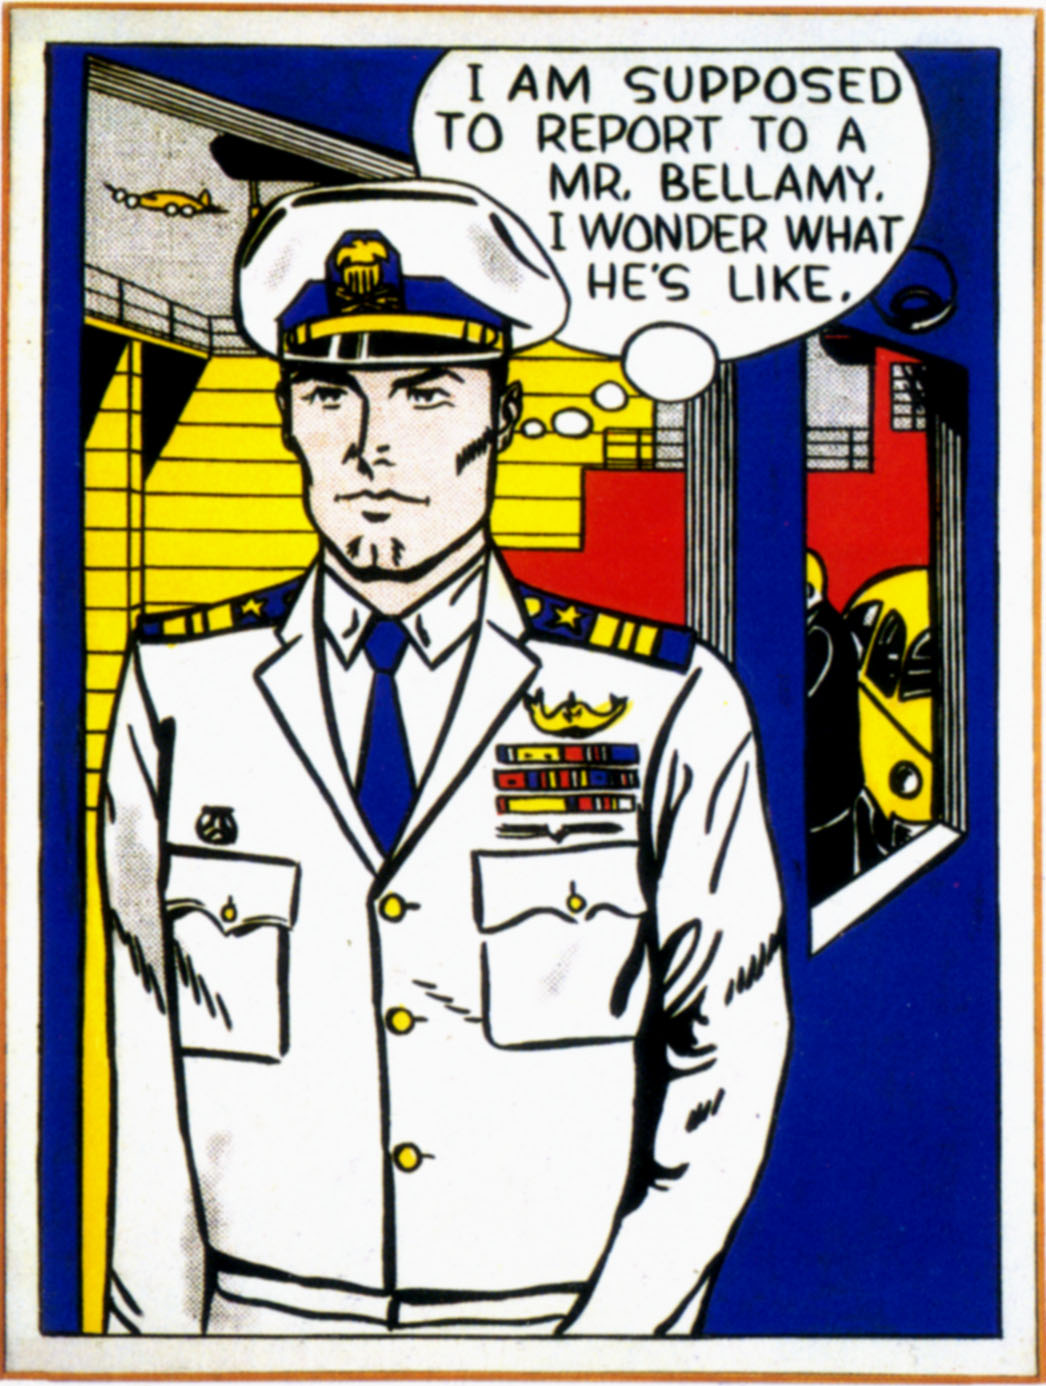 Iniciarte andy warhol as orixes - Pop art roy lichtenstein obras ...